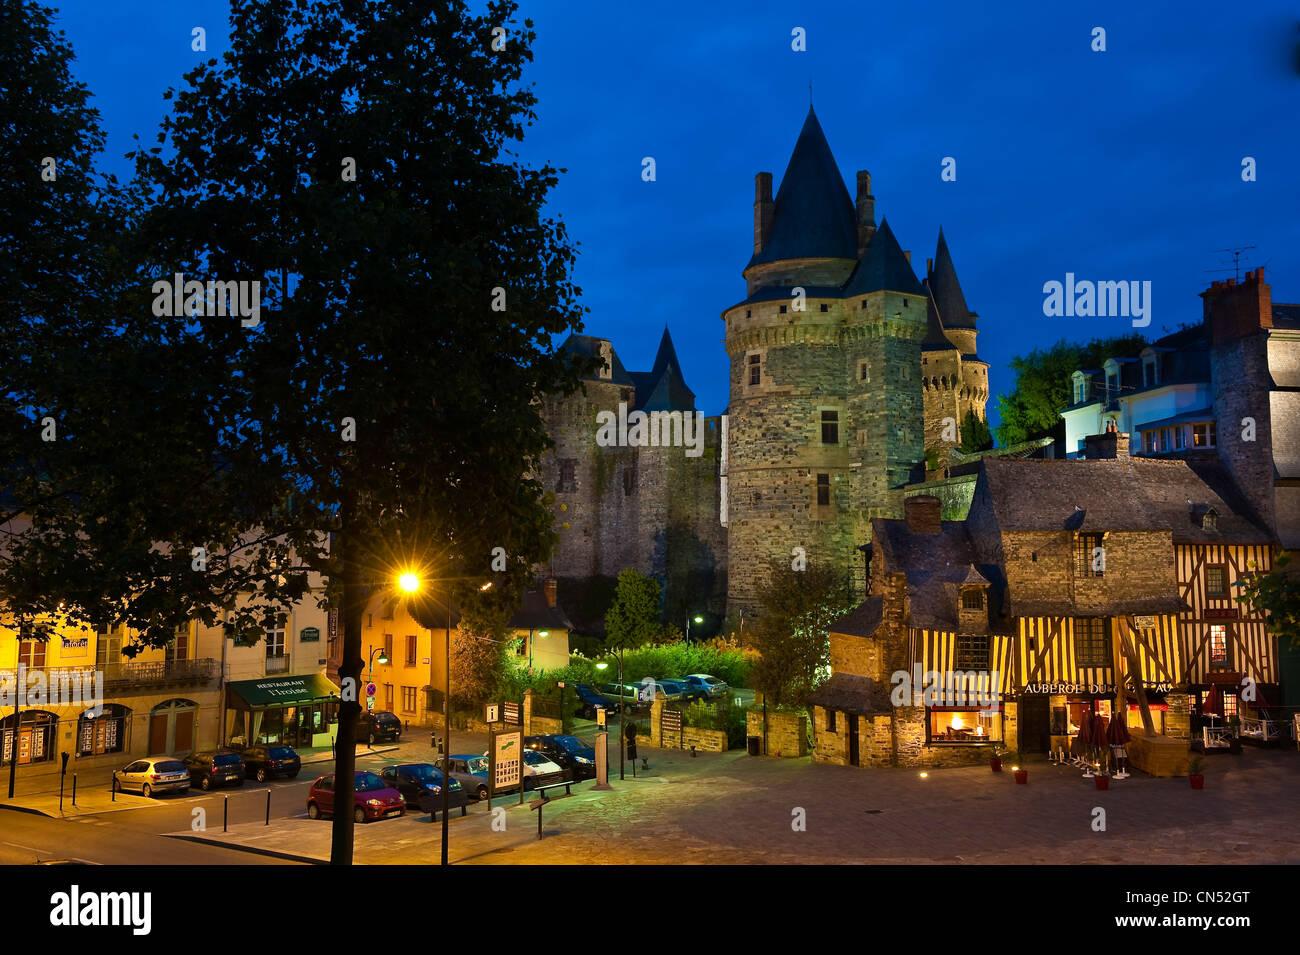 France, Ile et Vilaine, stop on the Way of St James, Vitre castle and Embas street - Stock Image